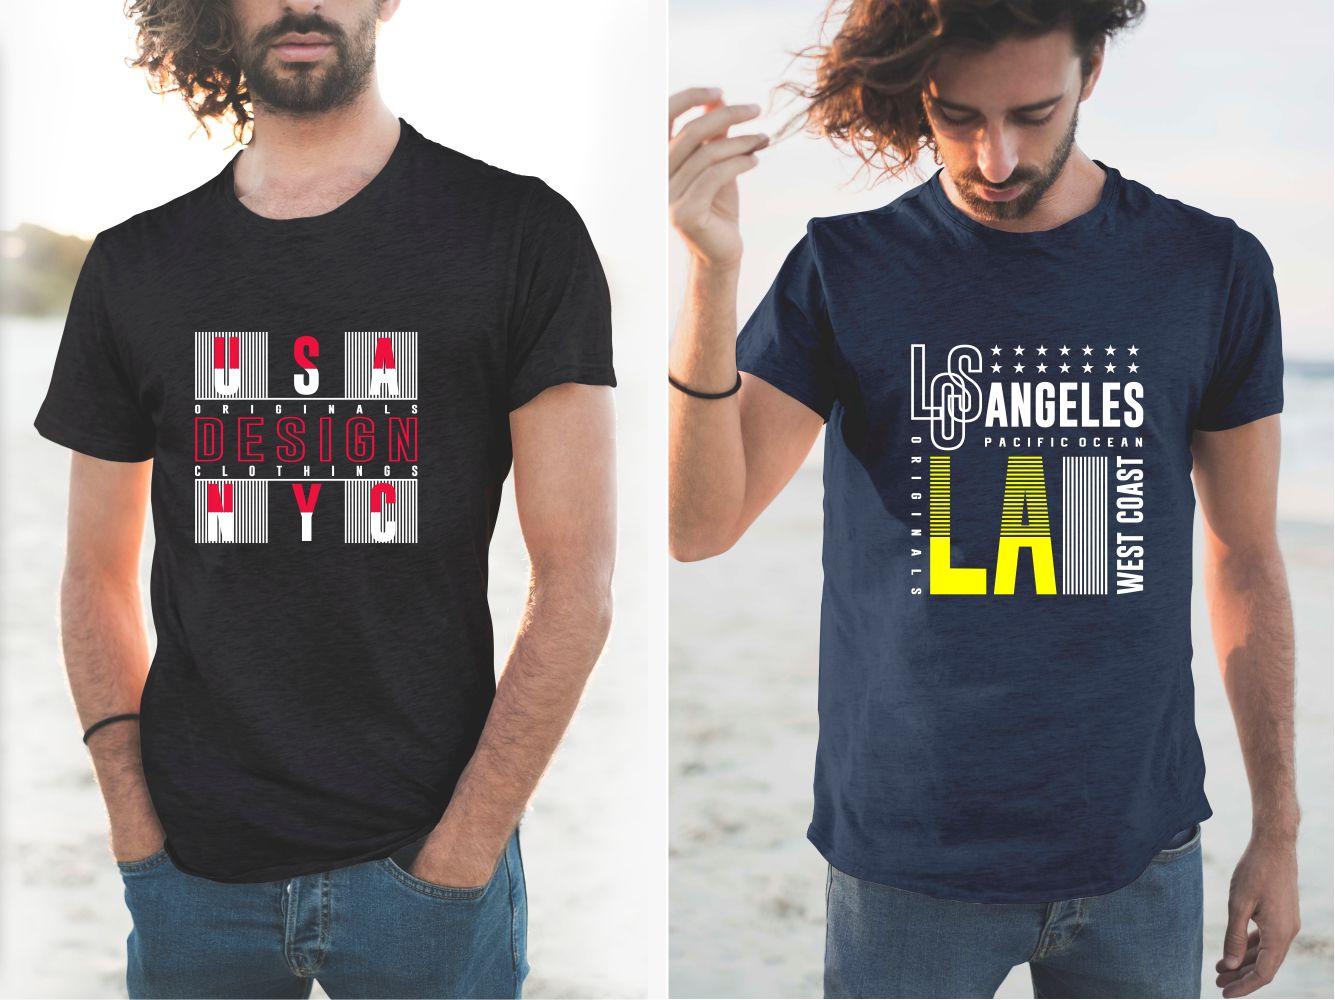 106 Urban T-shirt Designs Collection - 7 8